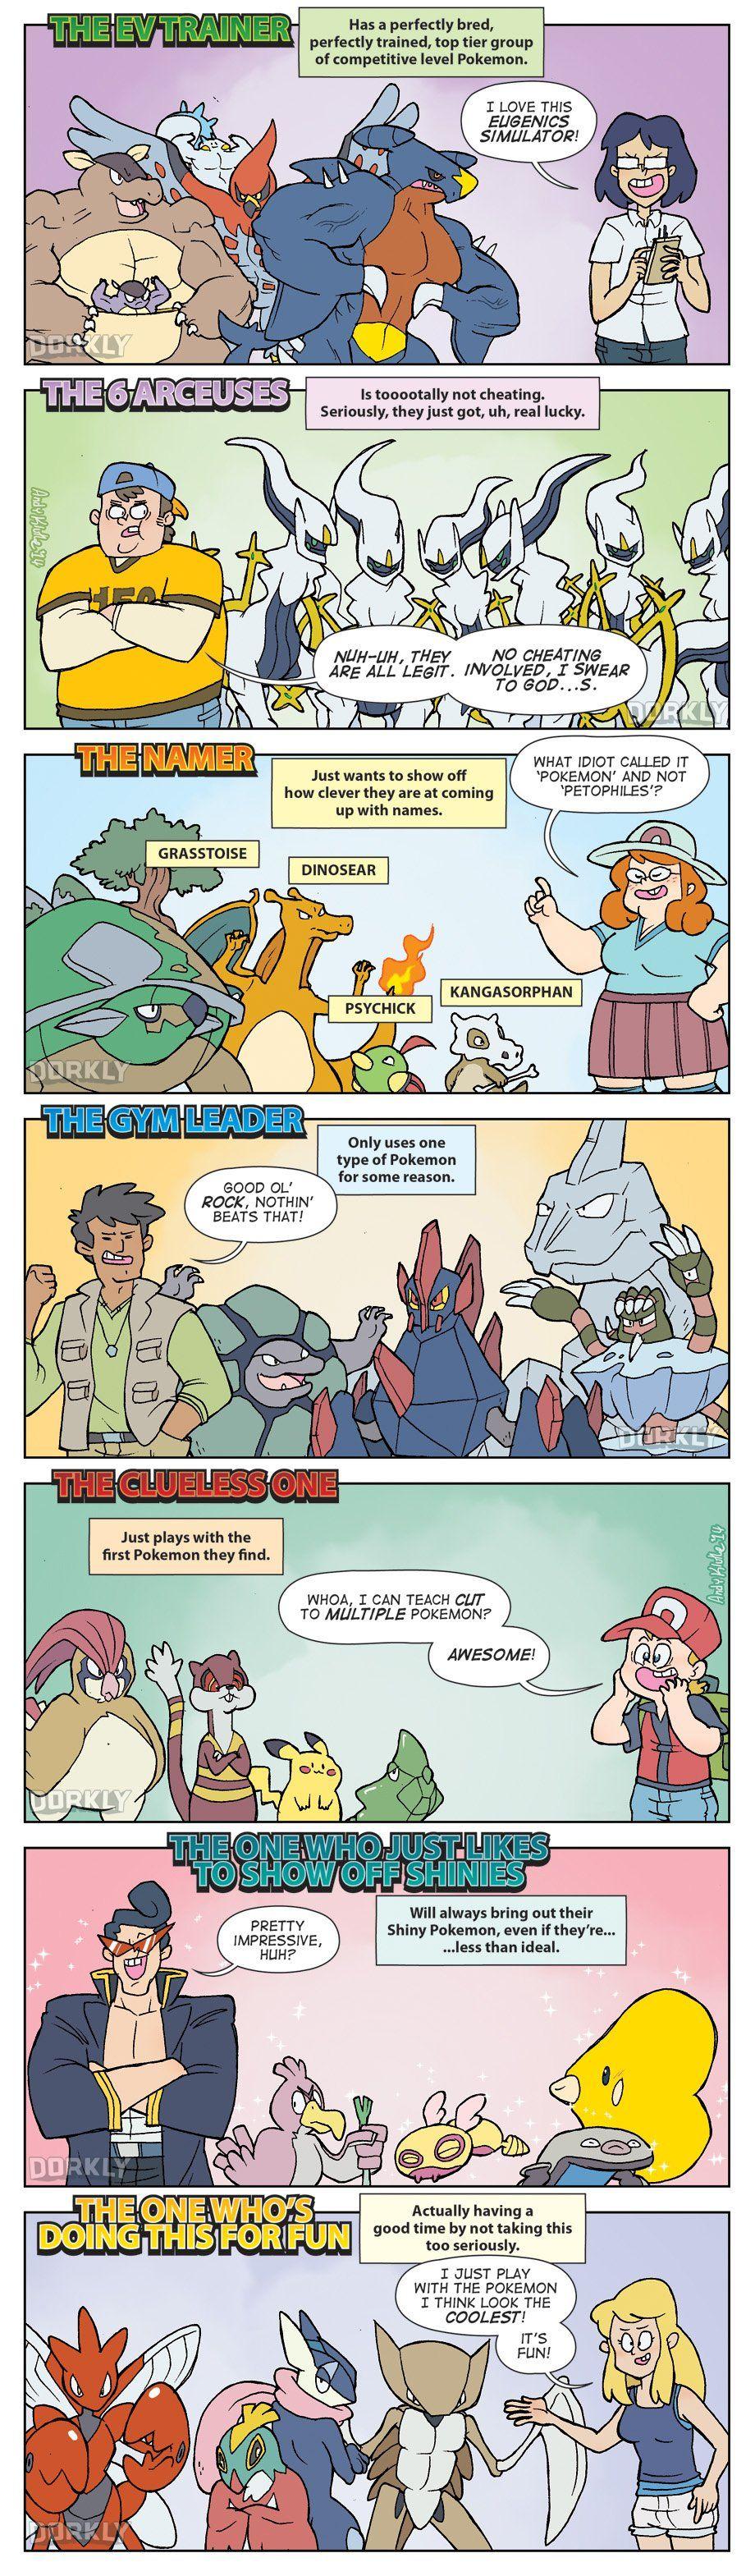 300 Pokémon Extreme Board Ideas Pokemon Pokemon Fan Pokemon Memes